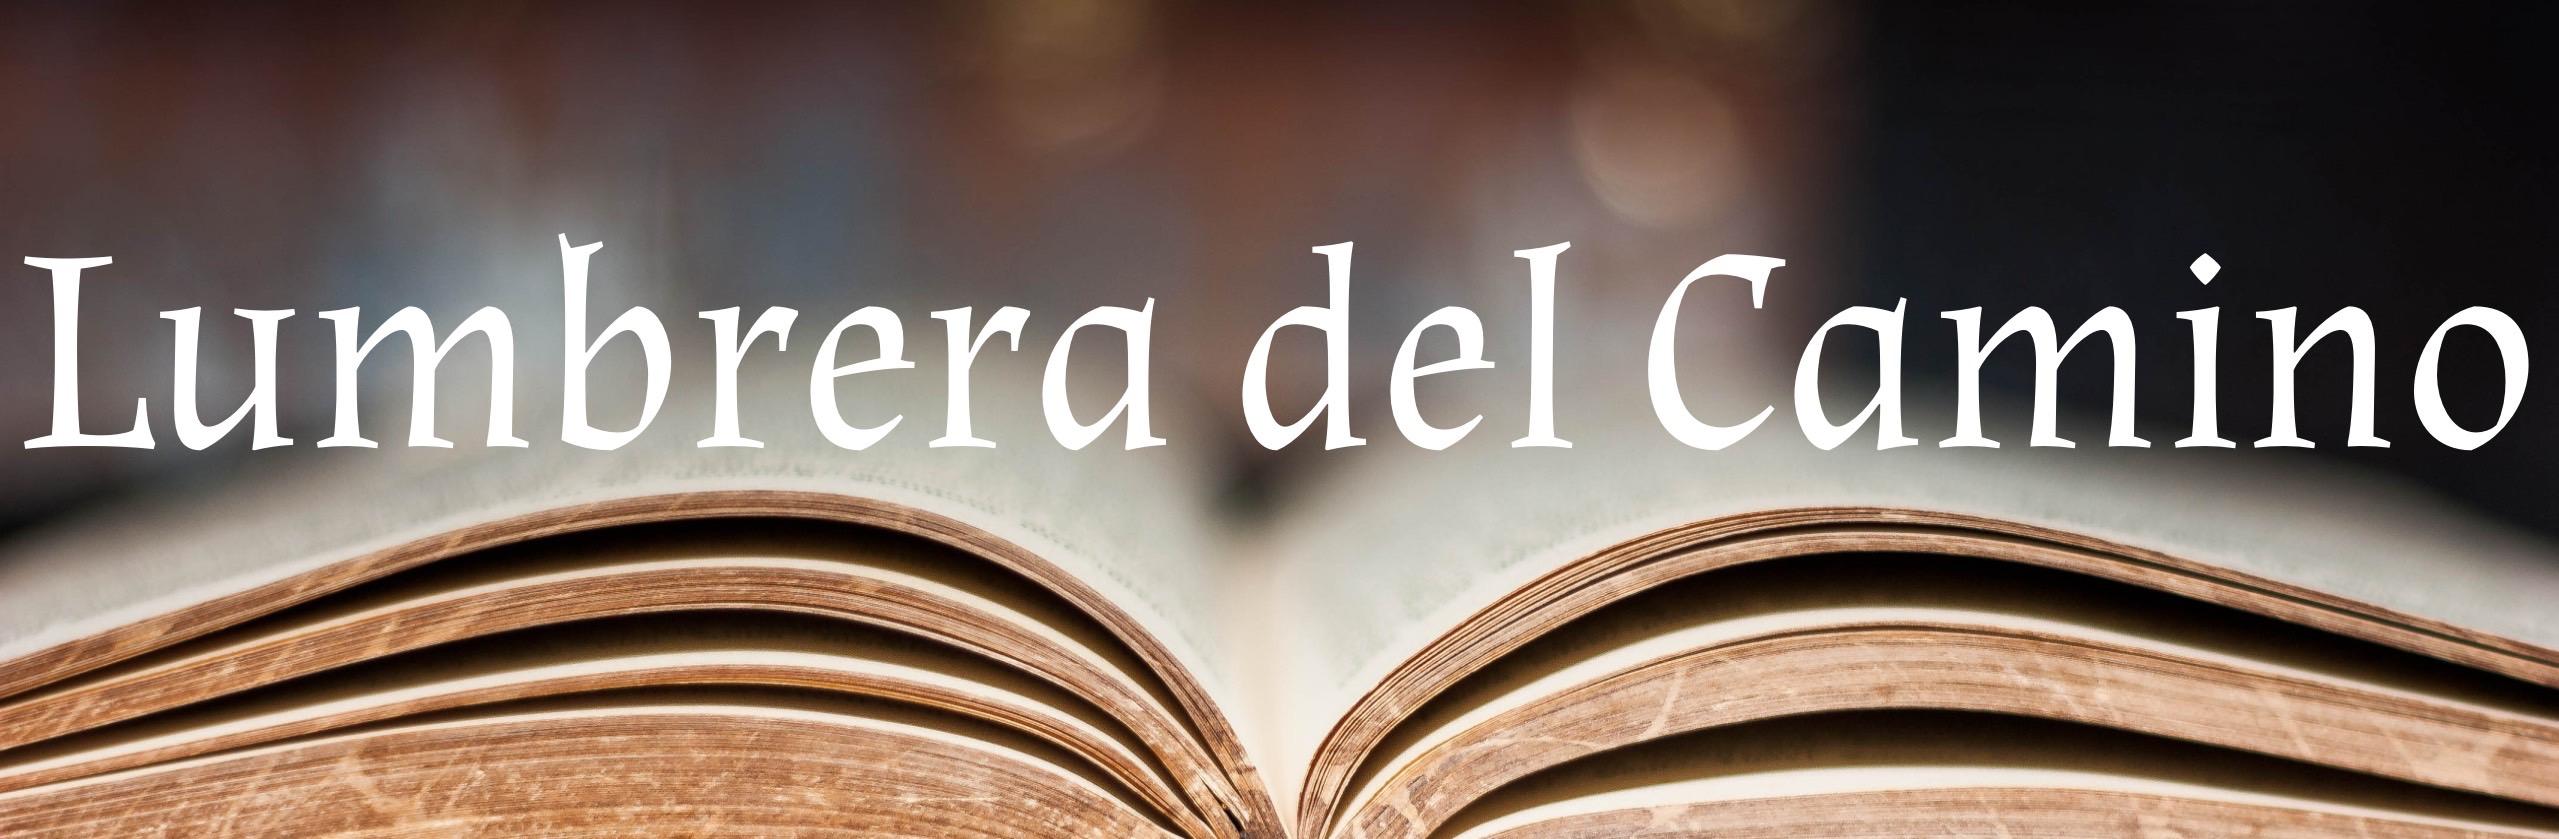 La mujer segn la Biblia El espritu de Jezabel y la